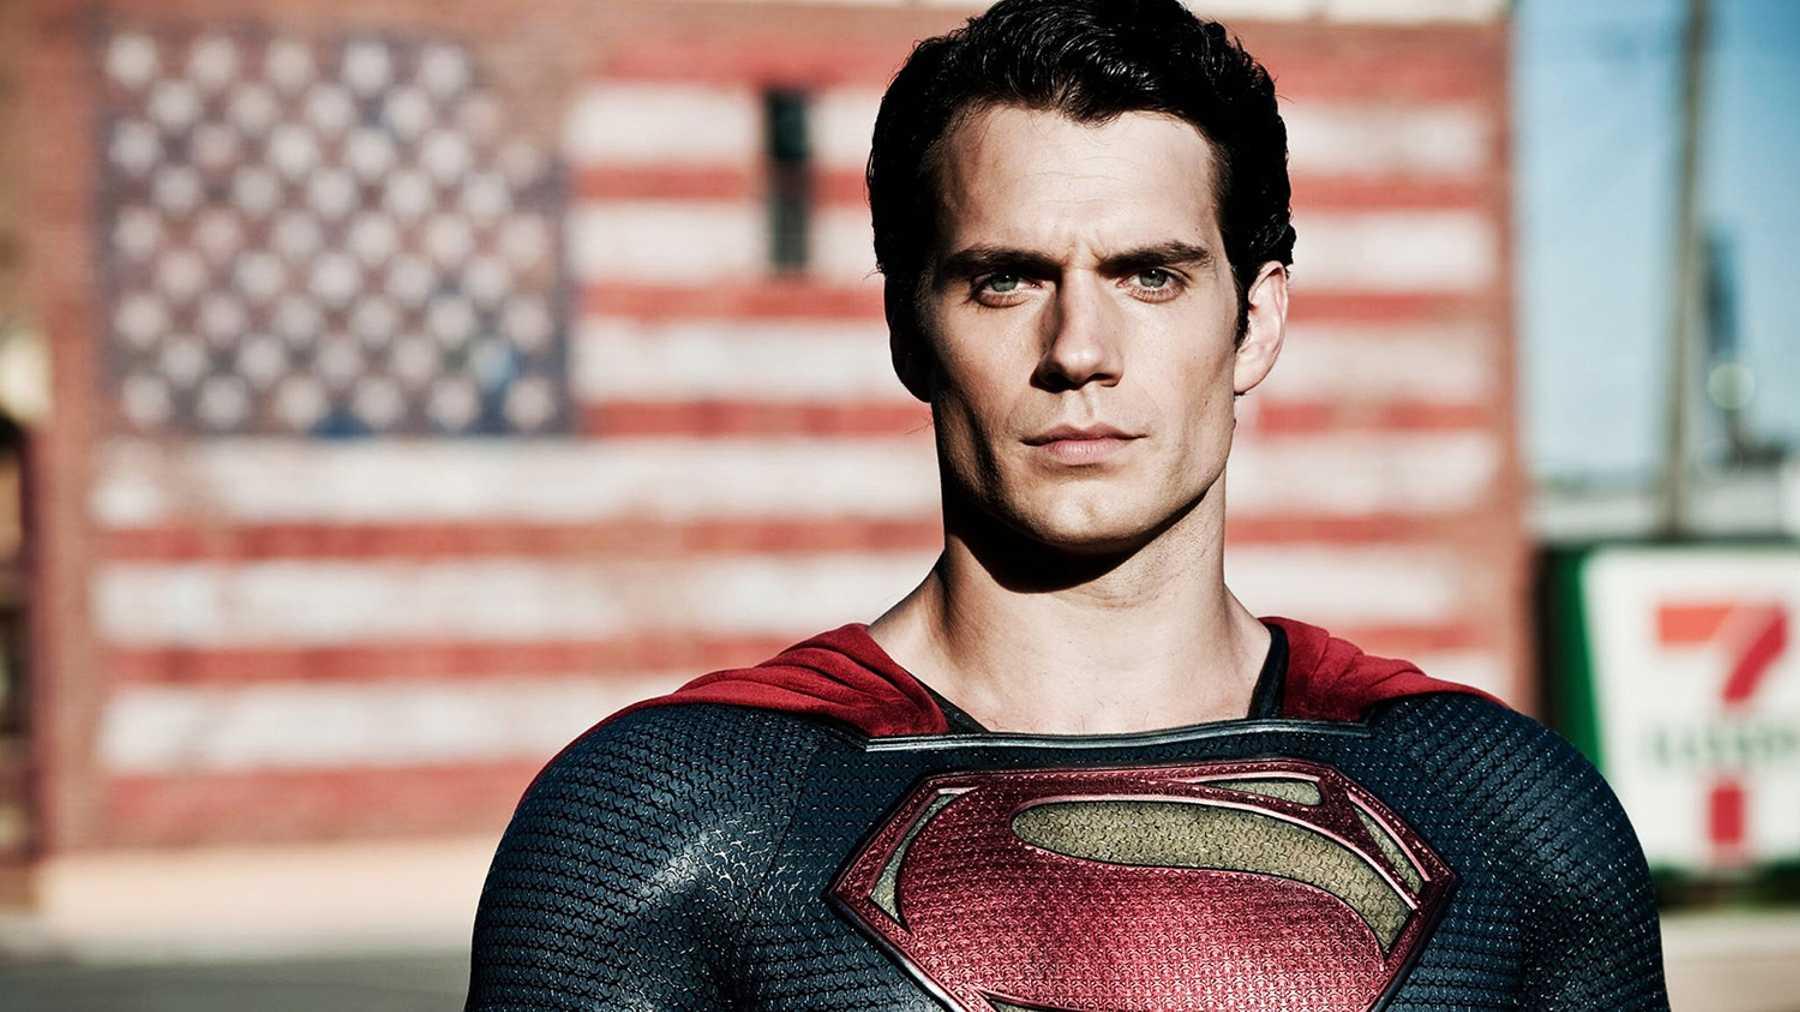 60253 Джеймс Ганн мог снять «Супермена», но выбрал «Отряд самоубийц»